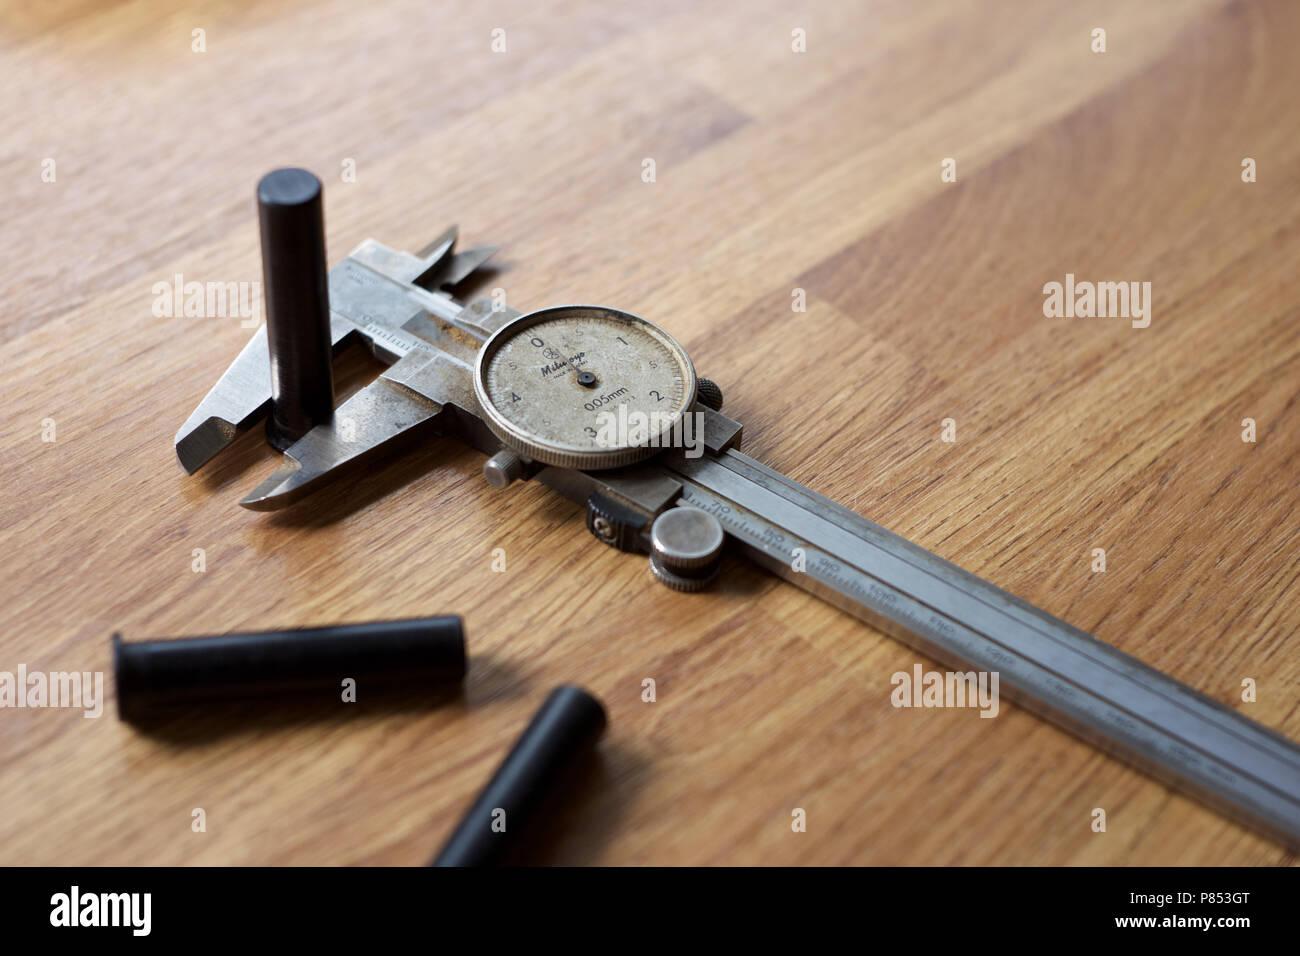 Metric analogue vernier gauge on the work bench. - Stock Image